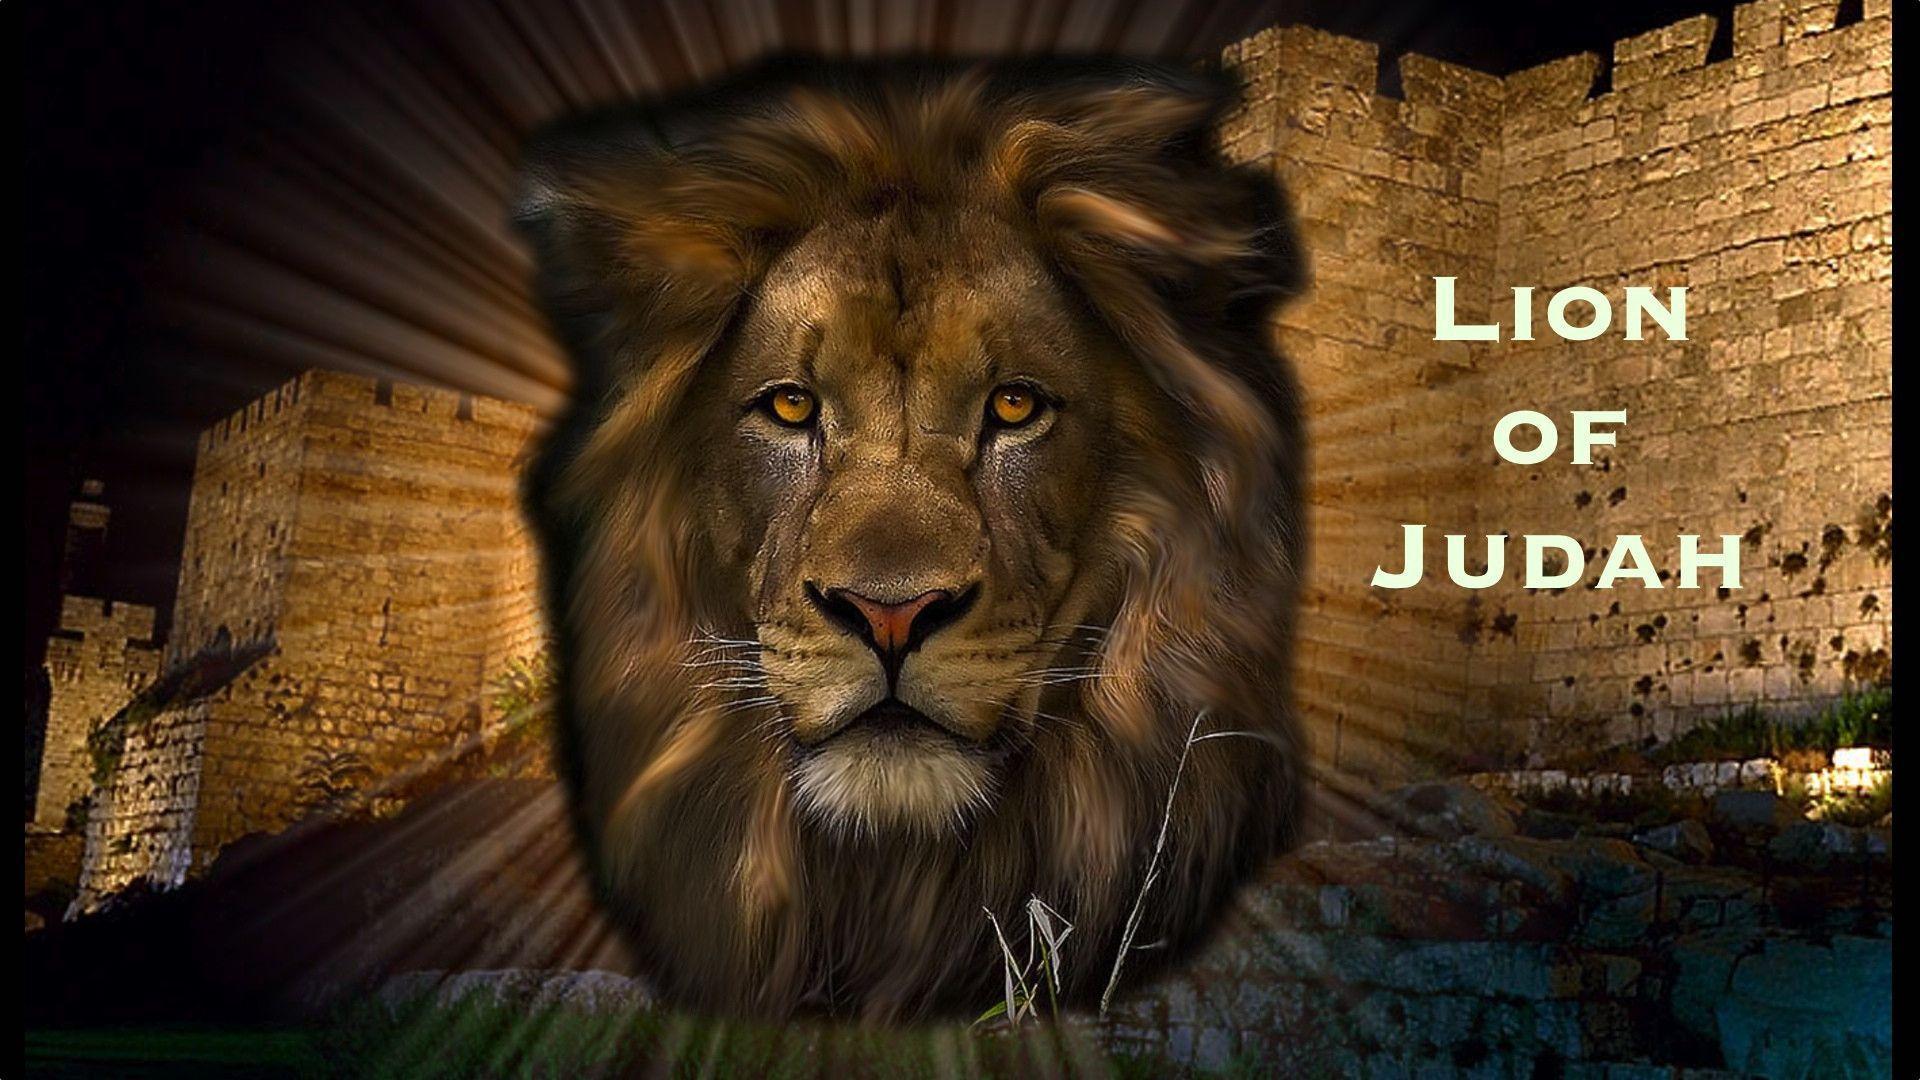 Lion Of Judah Wallpapers - Wallpaper Cave